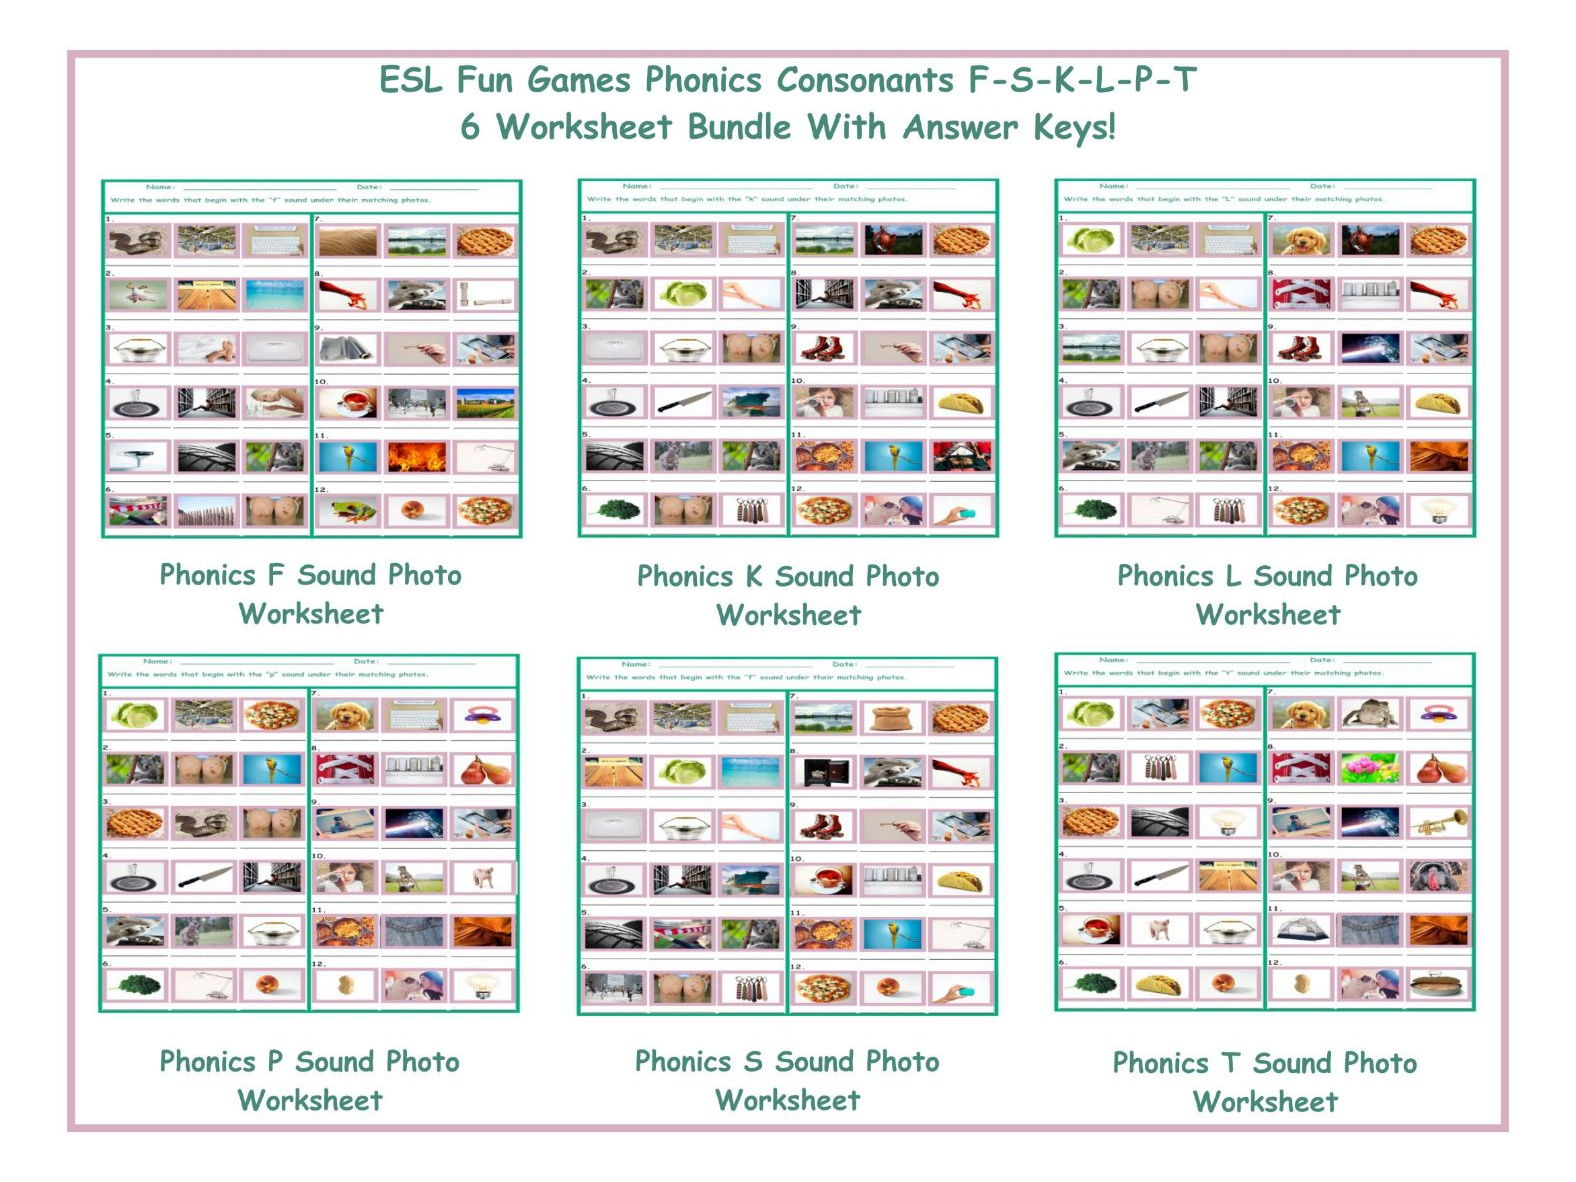 Phonics Consonants F S K L P T 6 Worksheet Bundle By Eslfungames